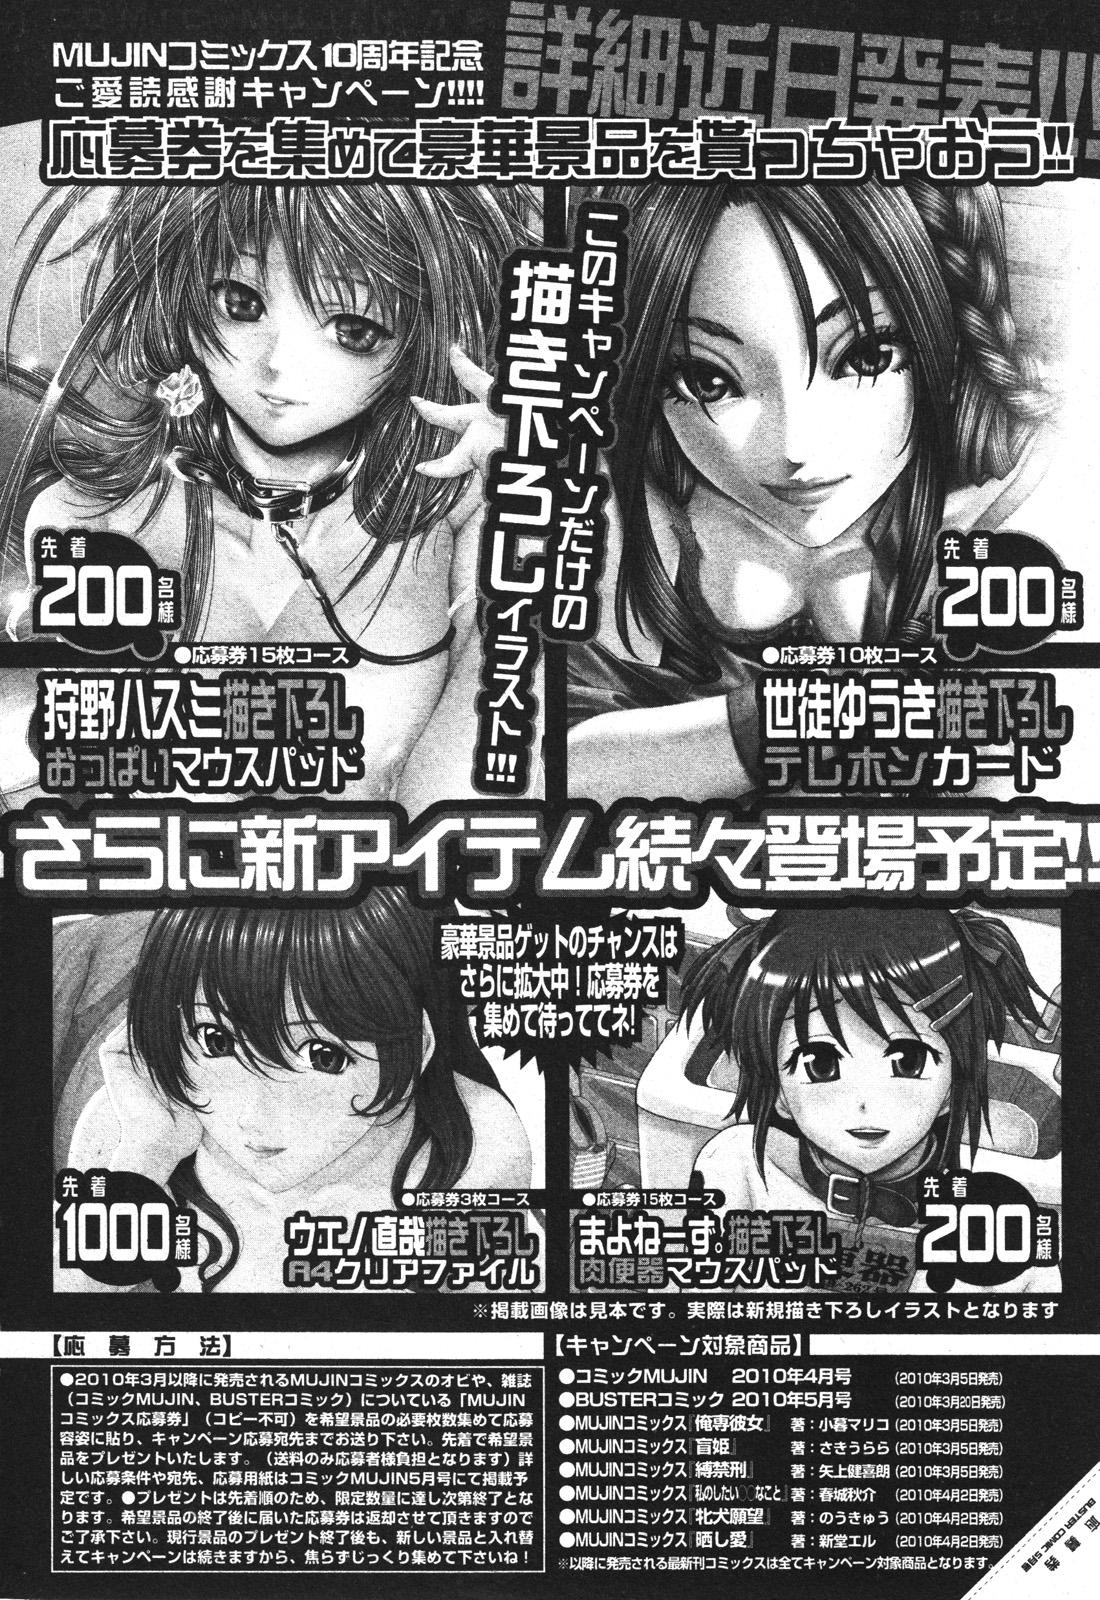 BUSTER COMIC 2010-05 Vol.07 476